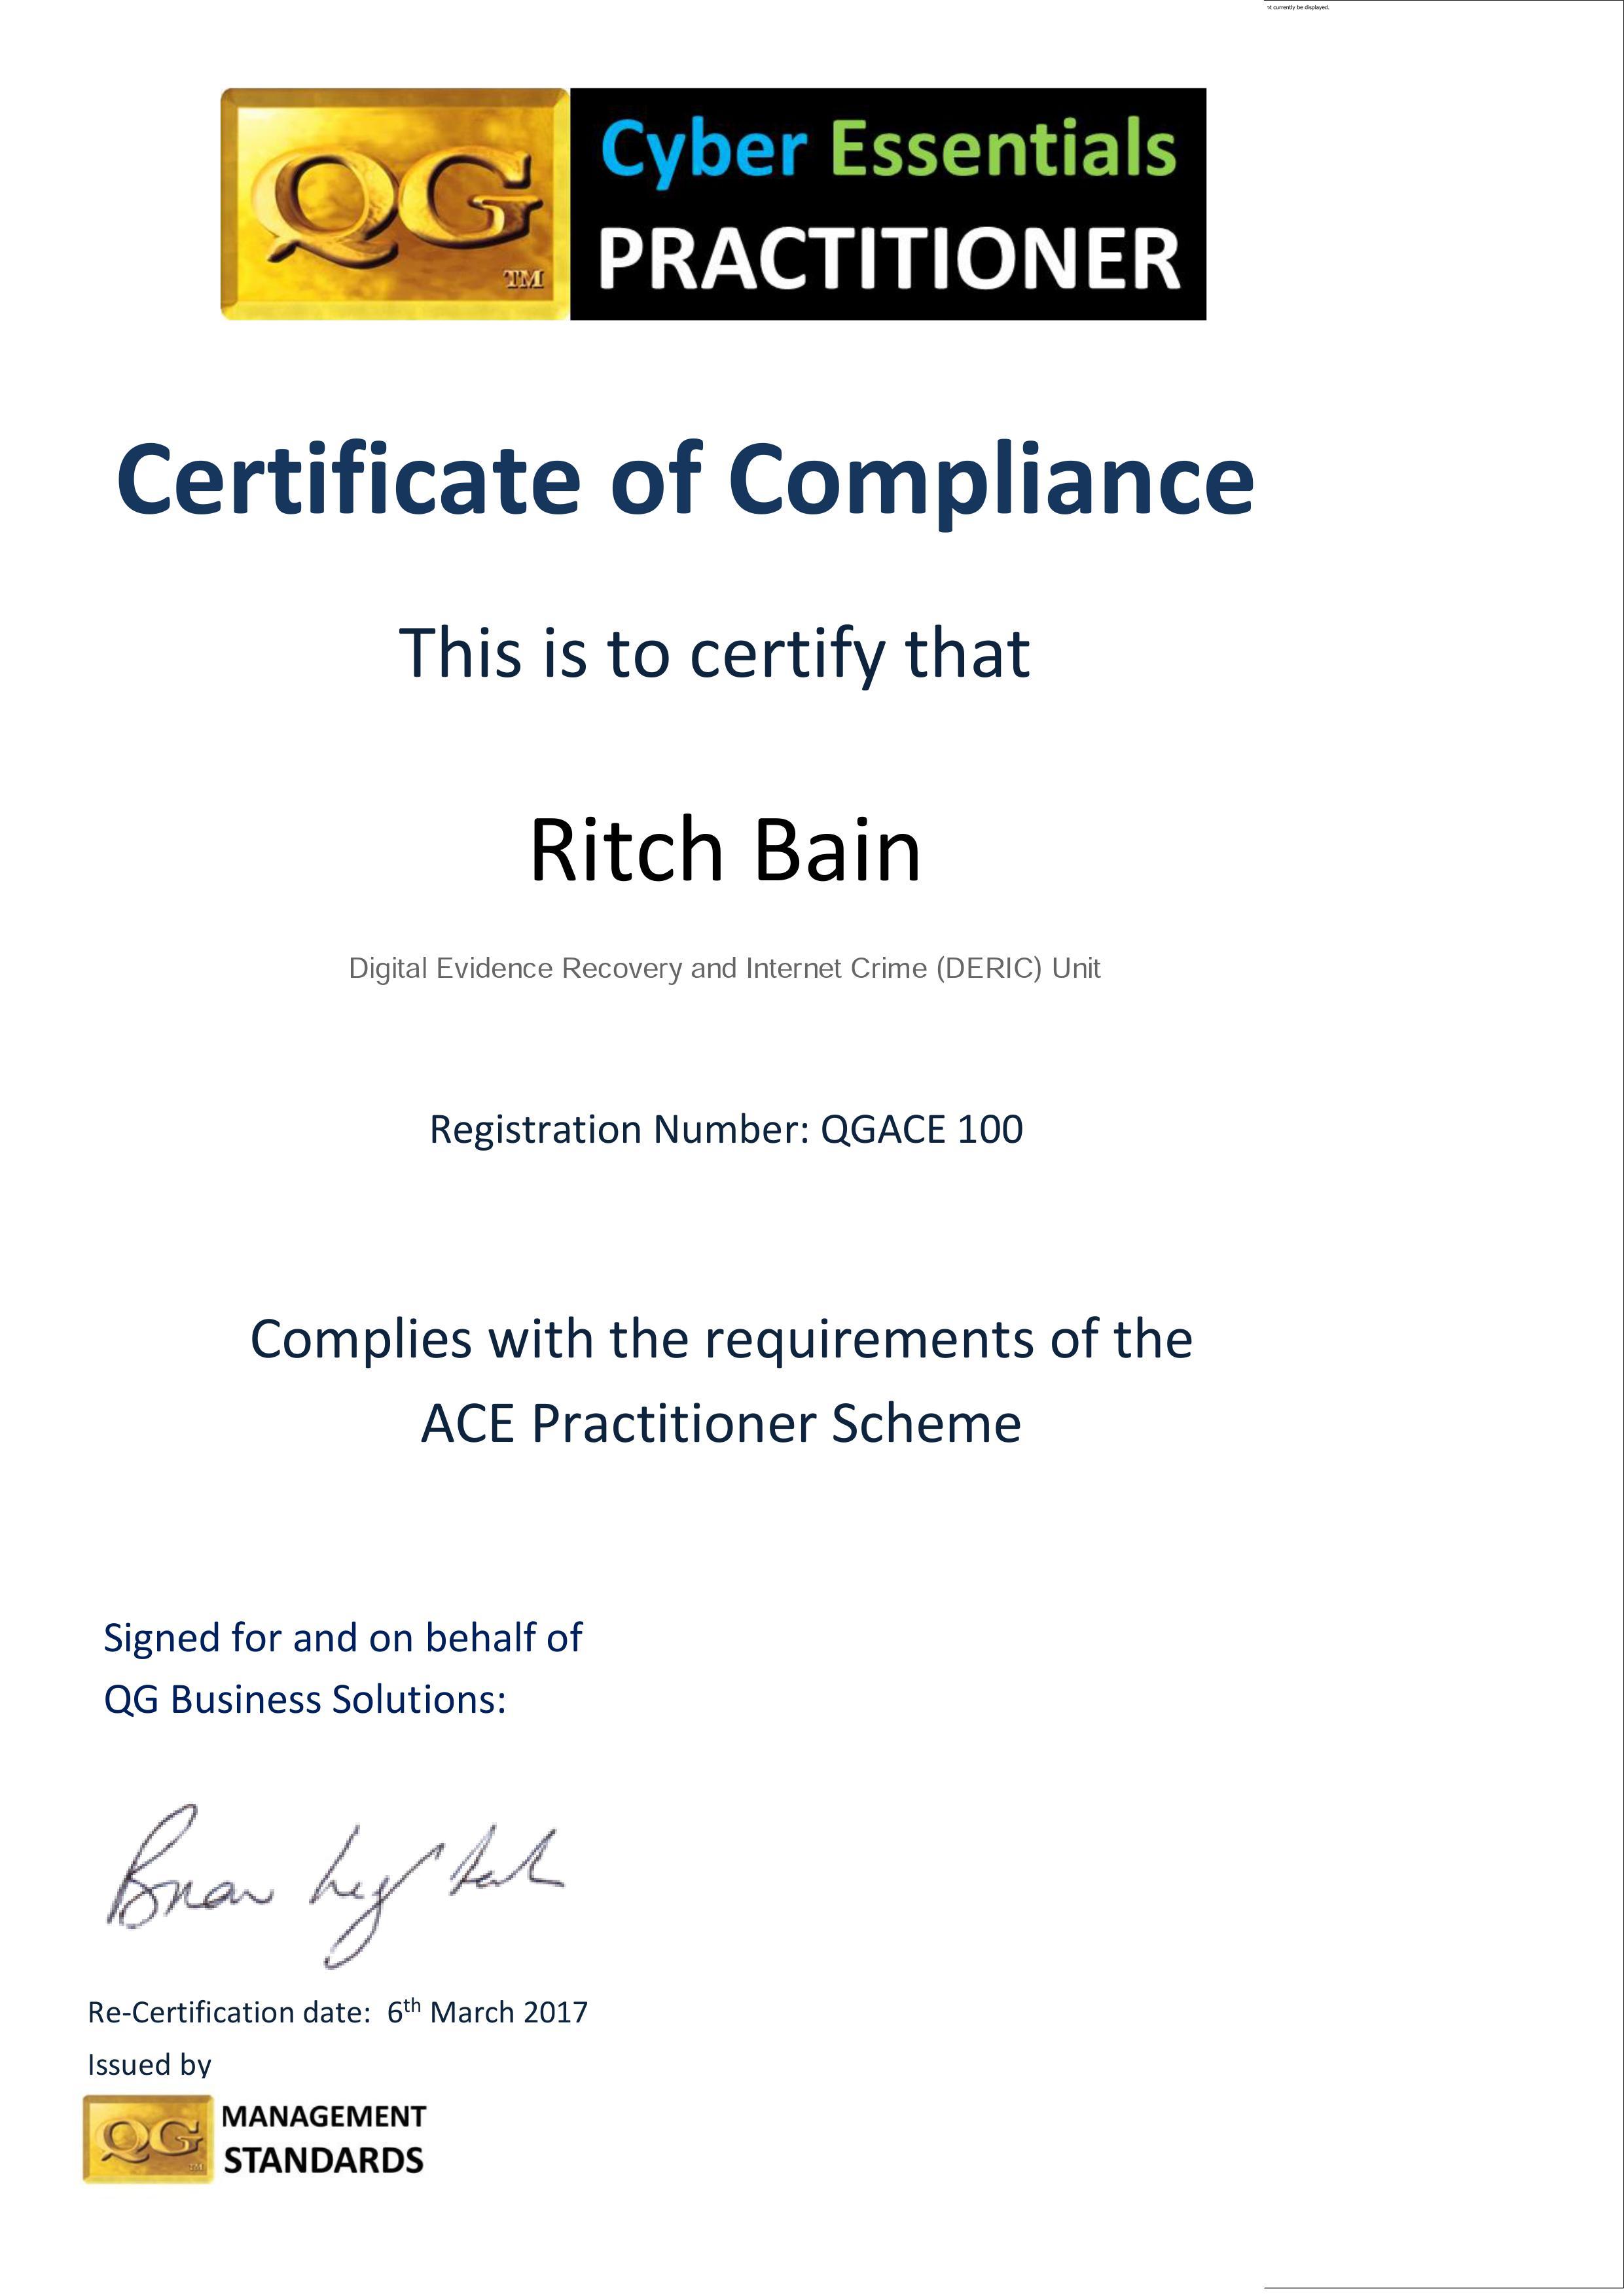 QGACE100 16 17 cert Ritch